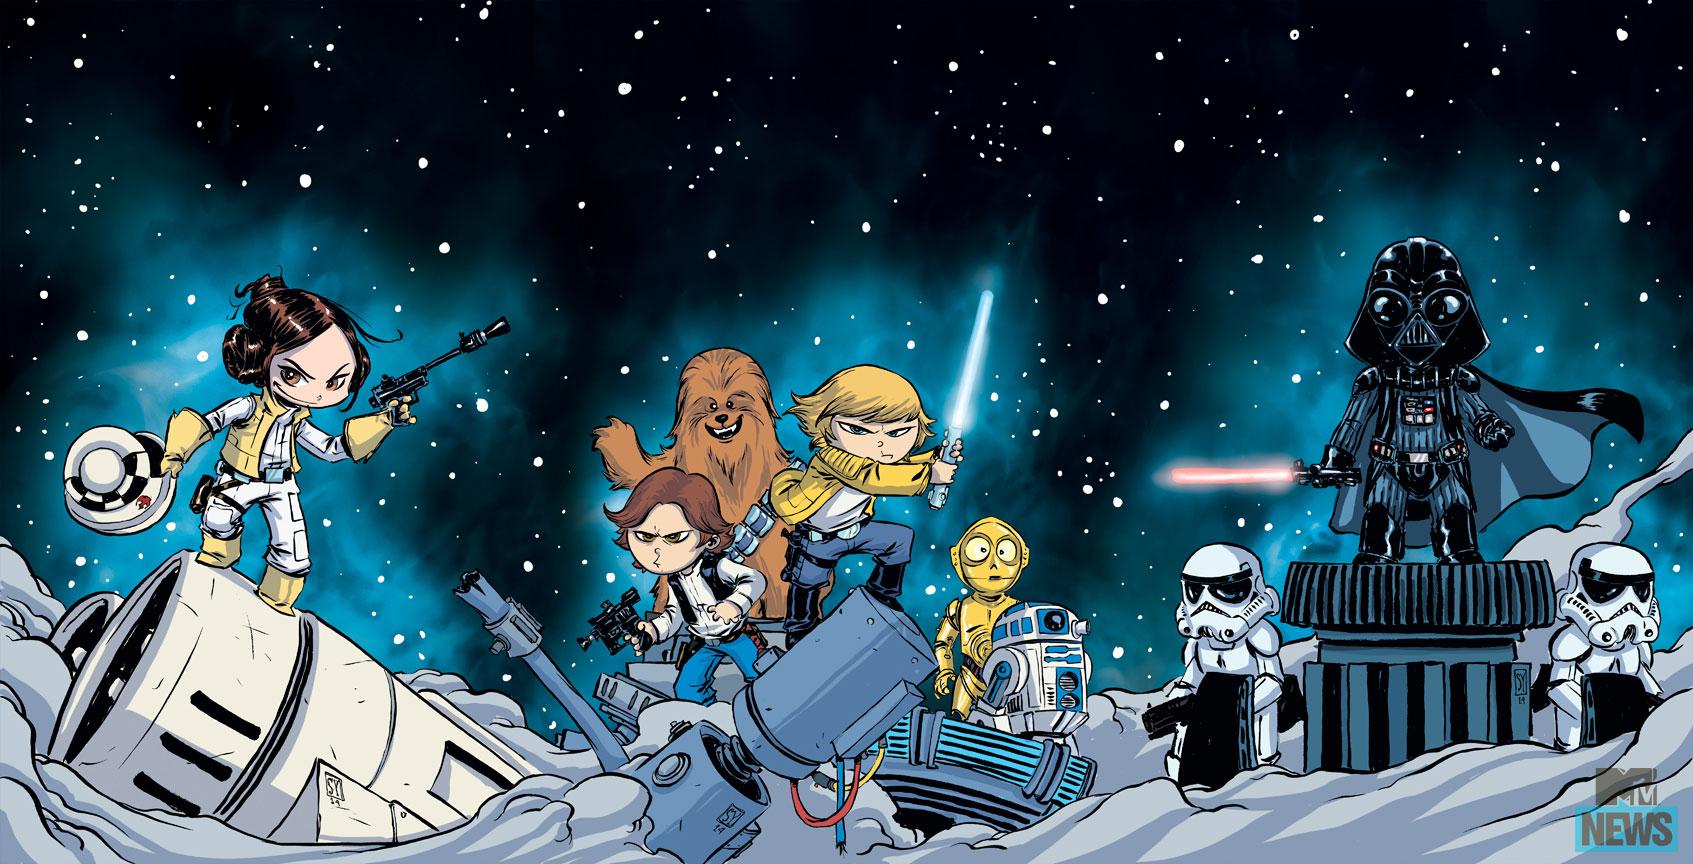 [ARTE] Star Wars em ilustrações (galeria)